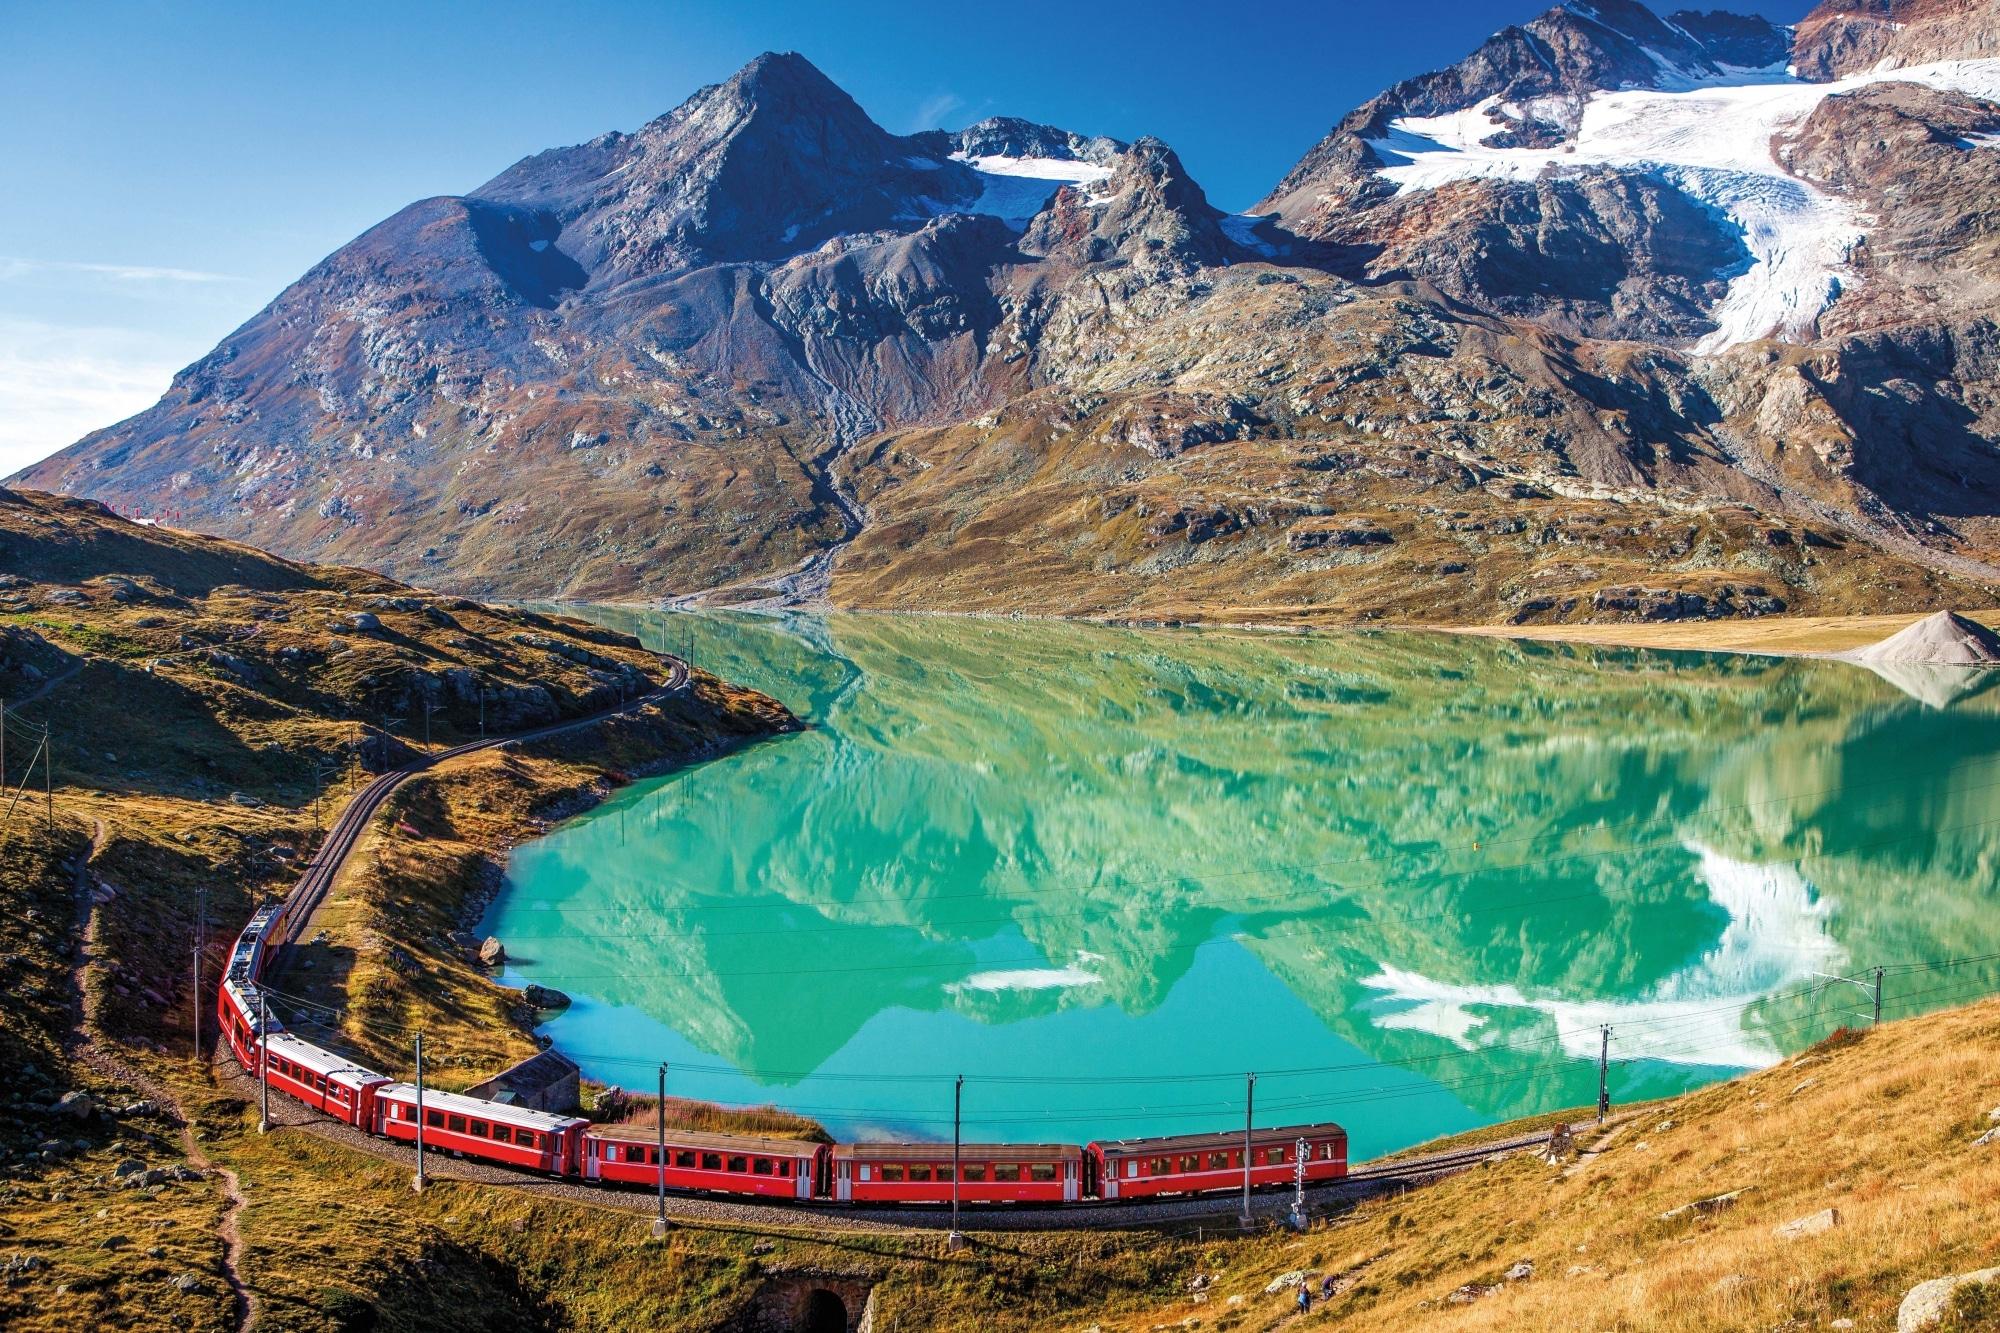 Schweiz, Berninapass